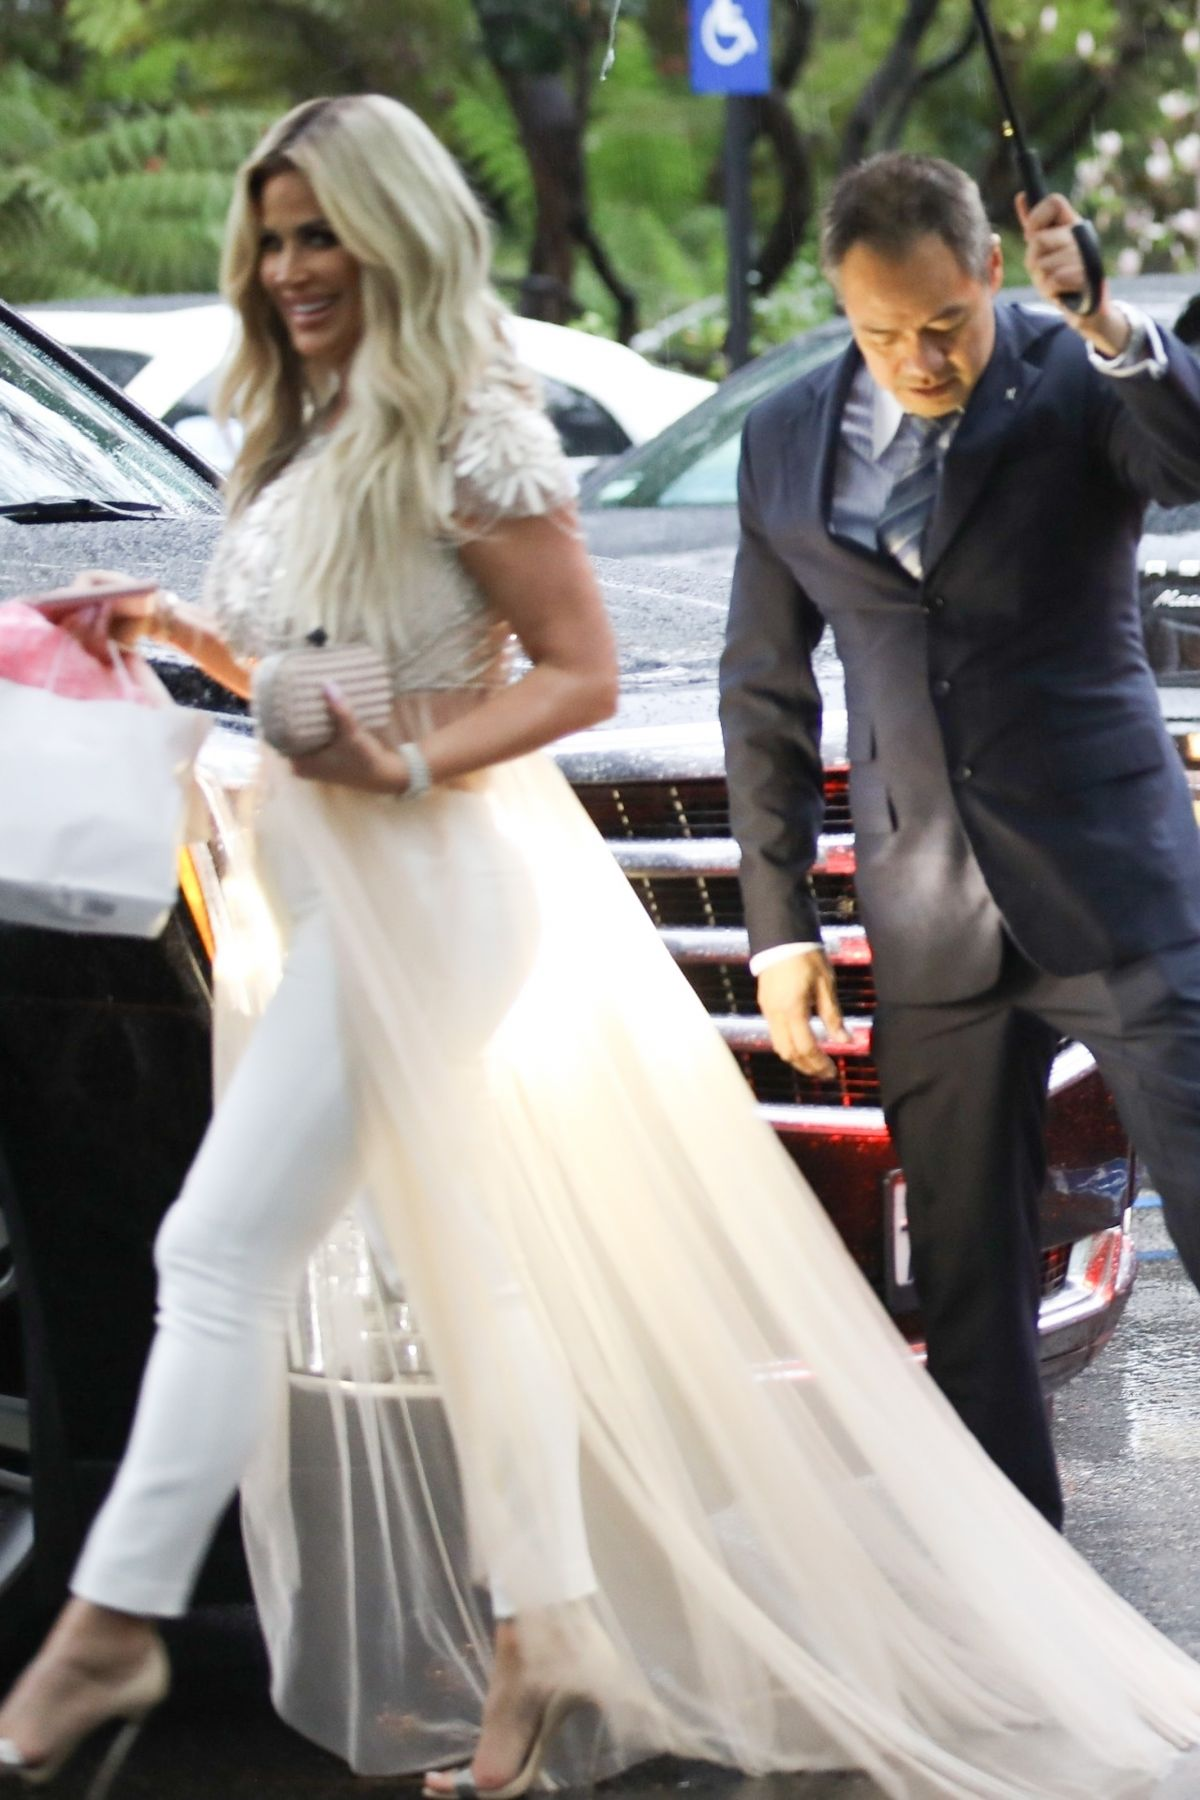 KIM ZOLCIAK and BRIELLE BIERMANN at Khloe Kardashian\'s Baby Shower ...